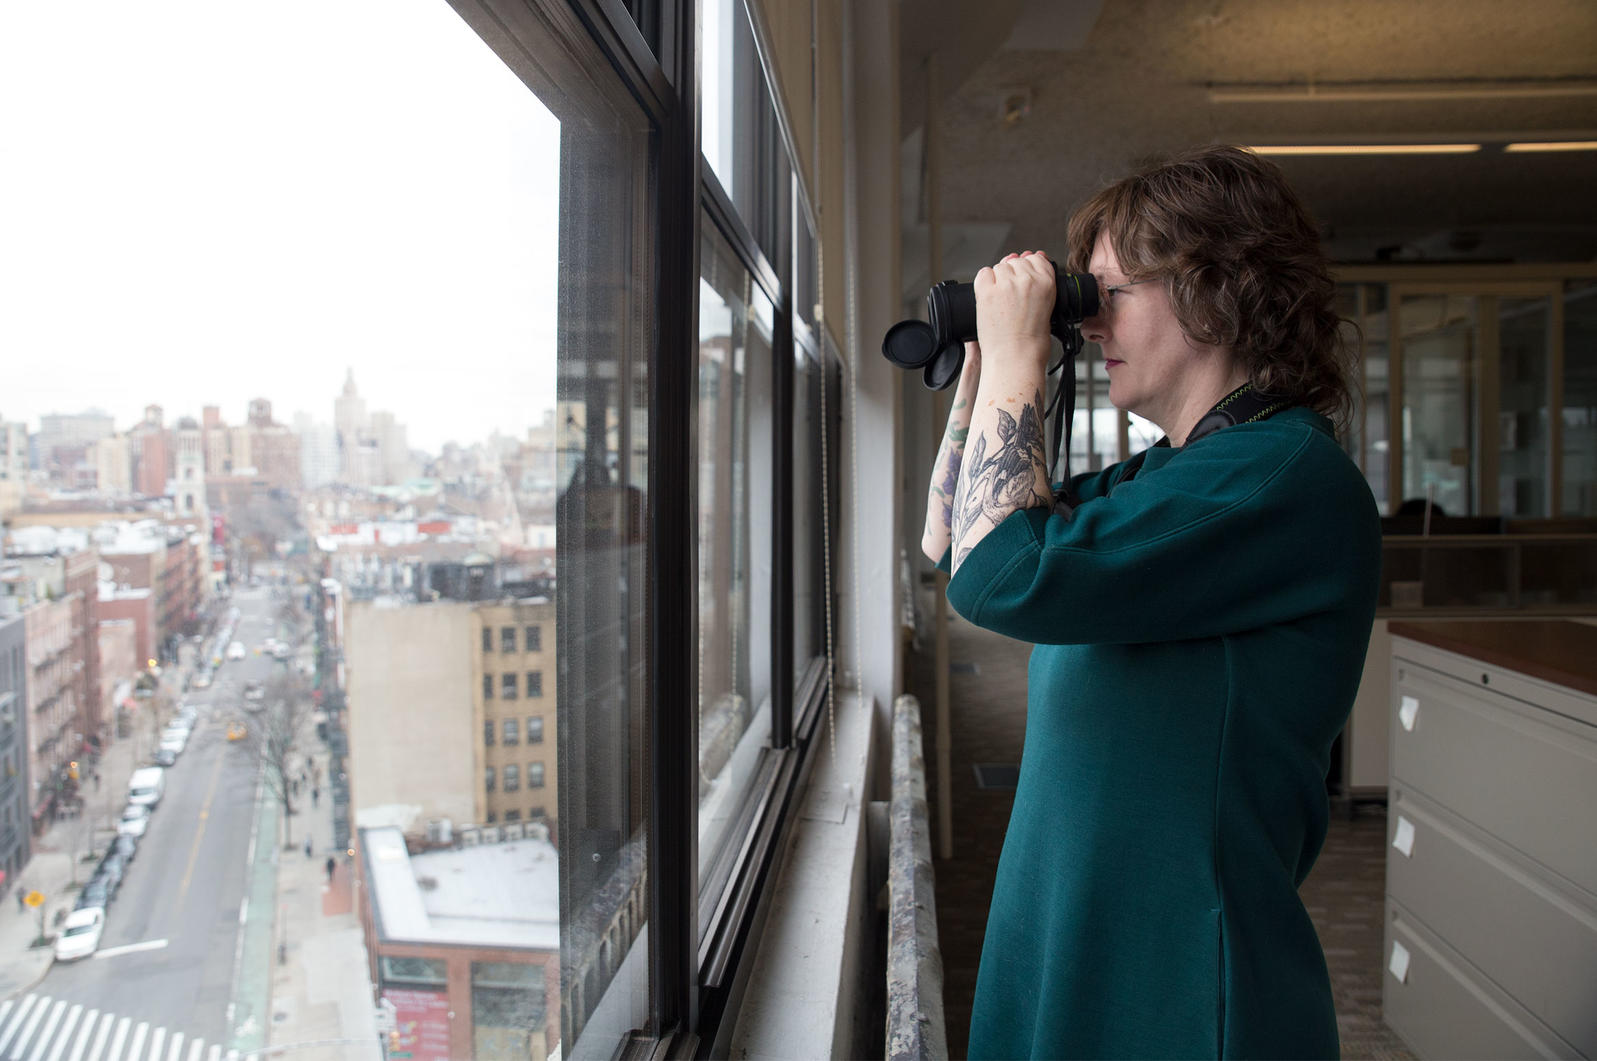 Martha Harbison, network content editor for the National Audubon Society, scans for birds from the windows of Audubon's New York City headquarters. Lia Bocchiaro/Audubon